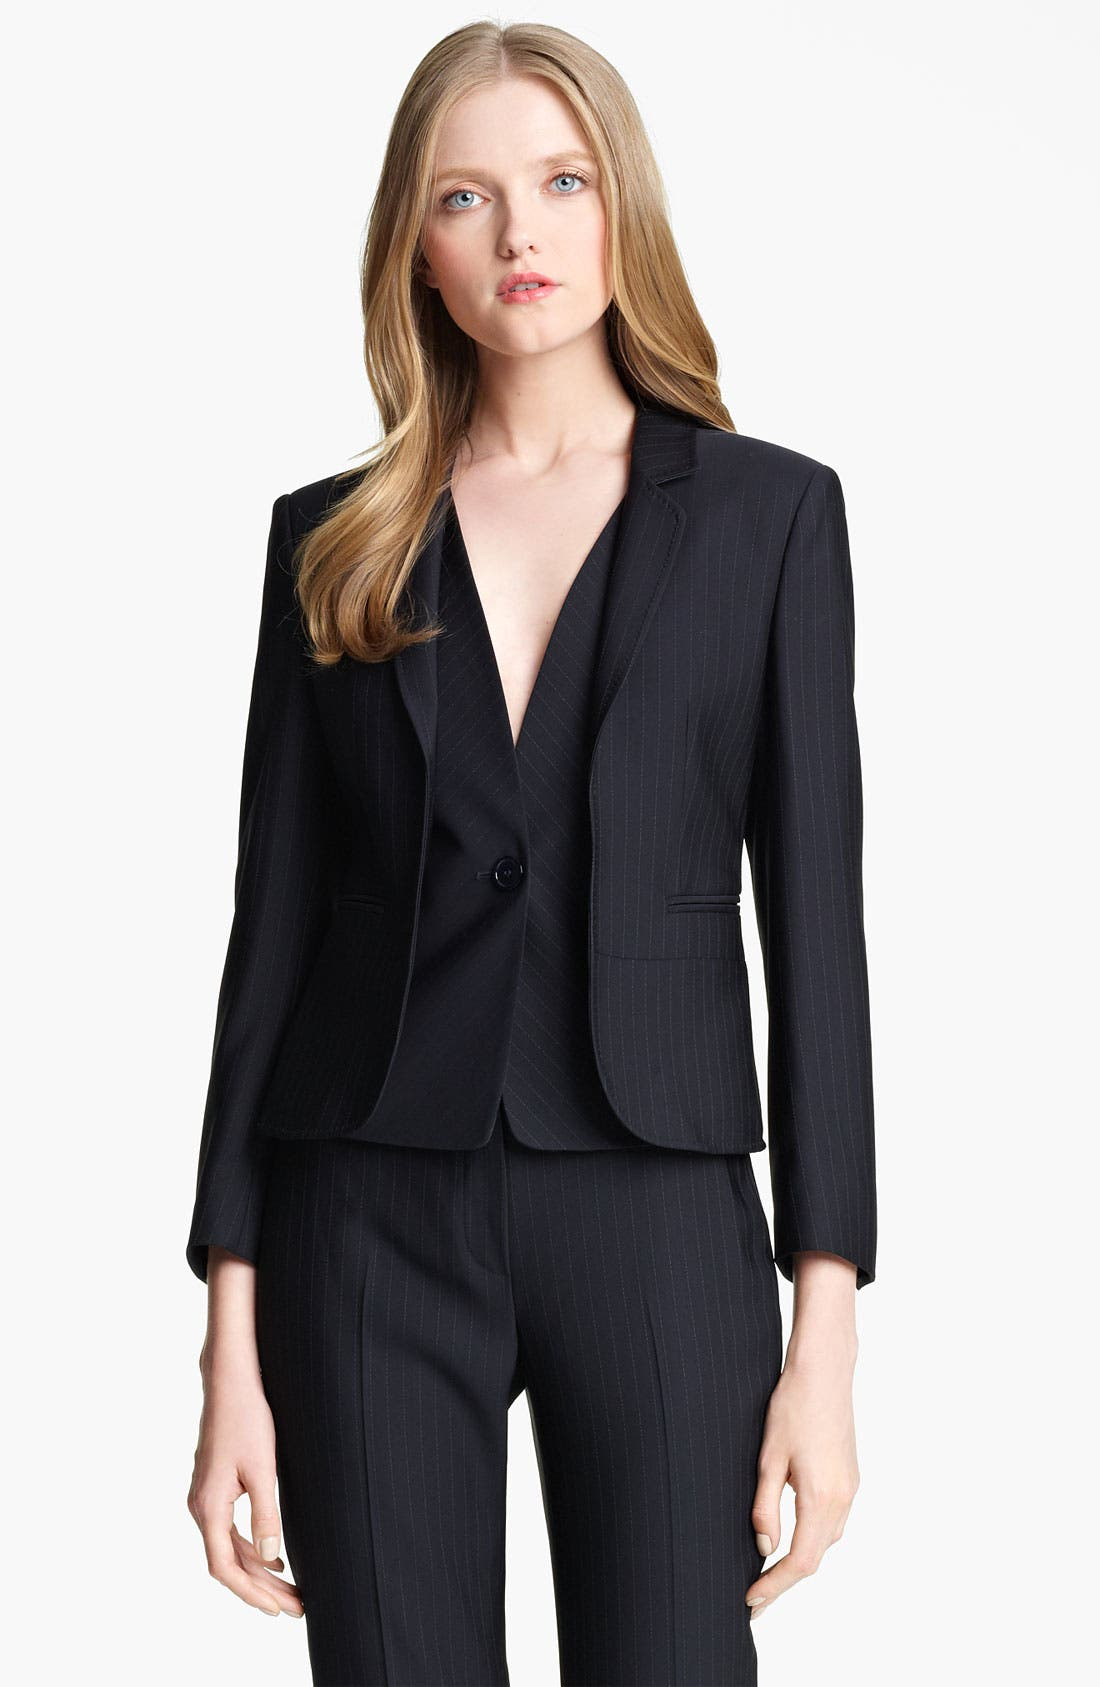 Main Image - Armani Collezioni Pinstripe Jacket with Attached Vest